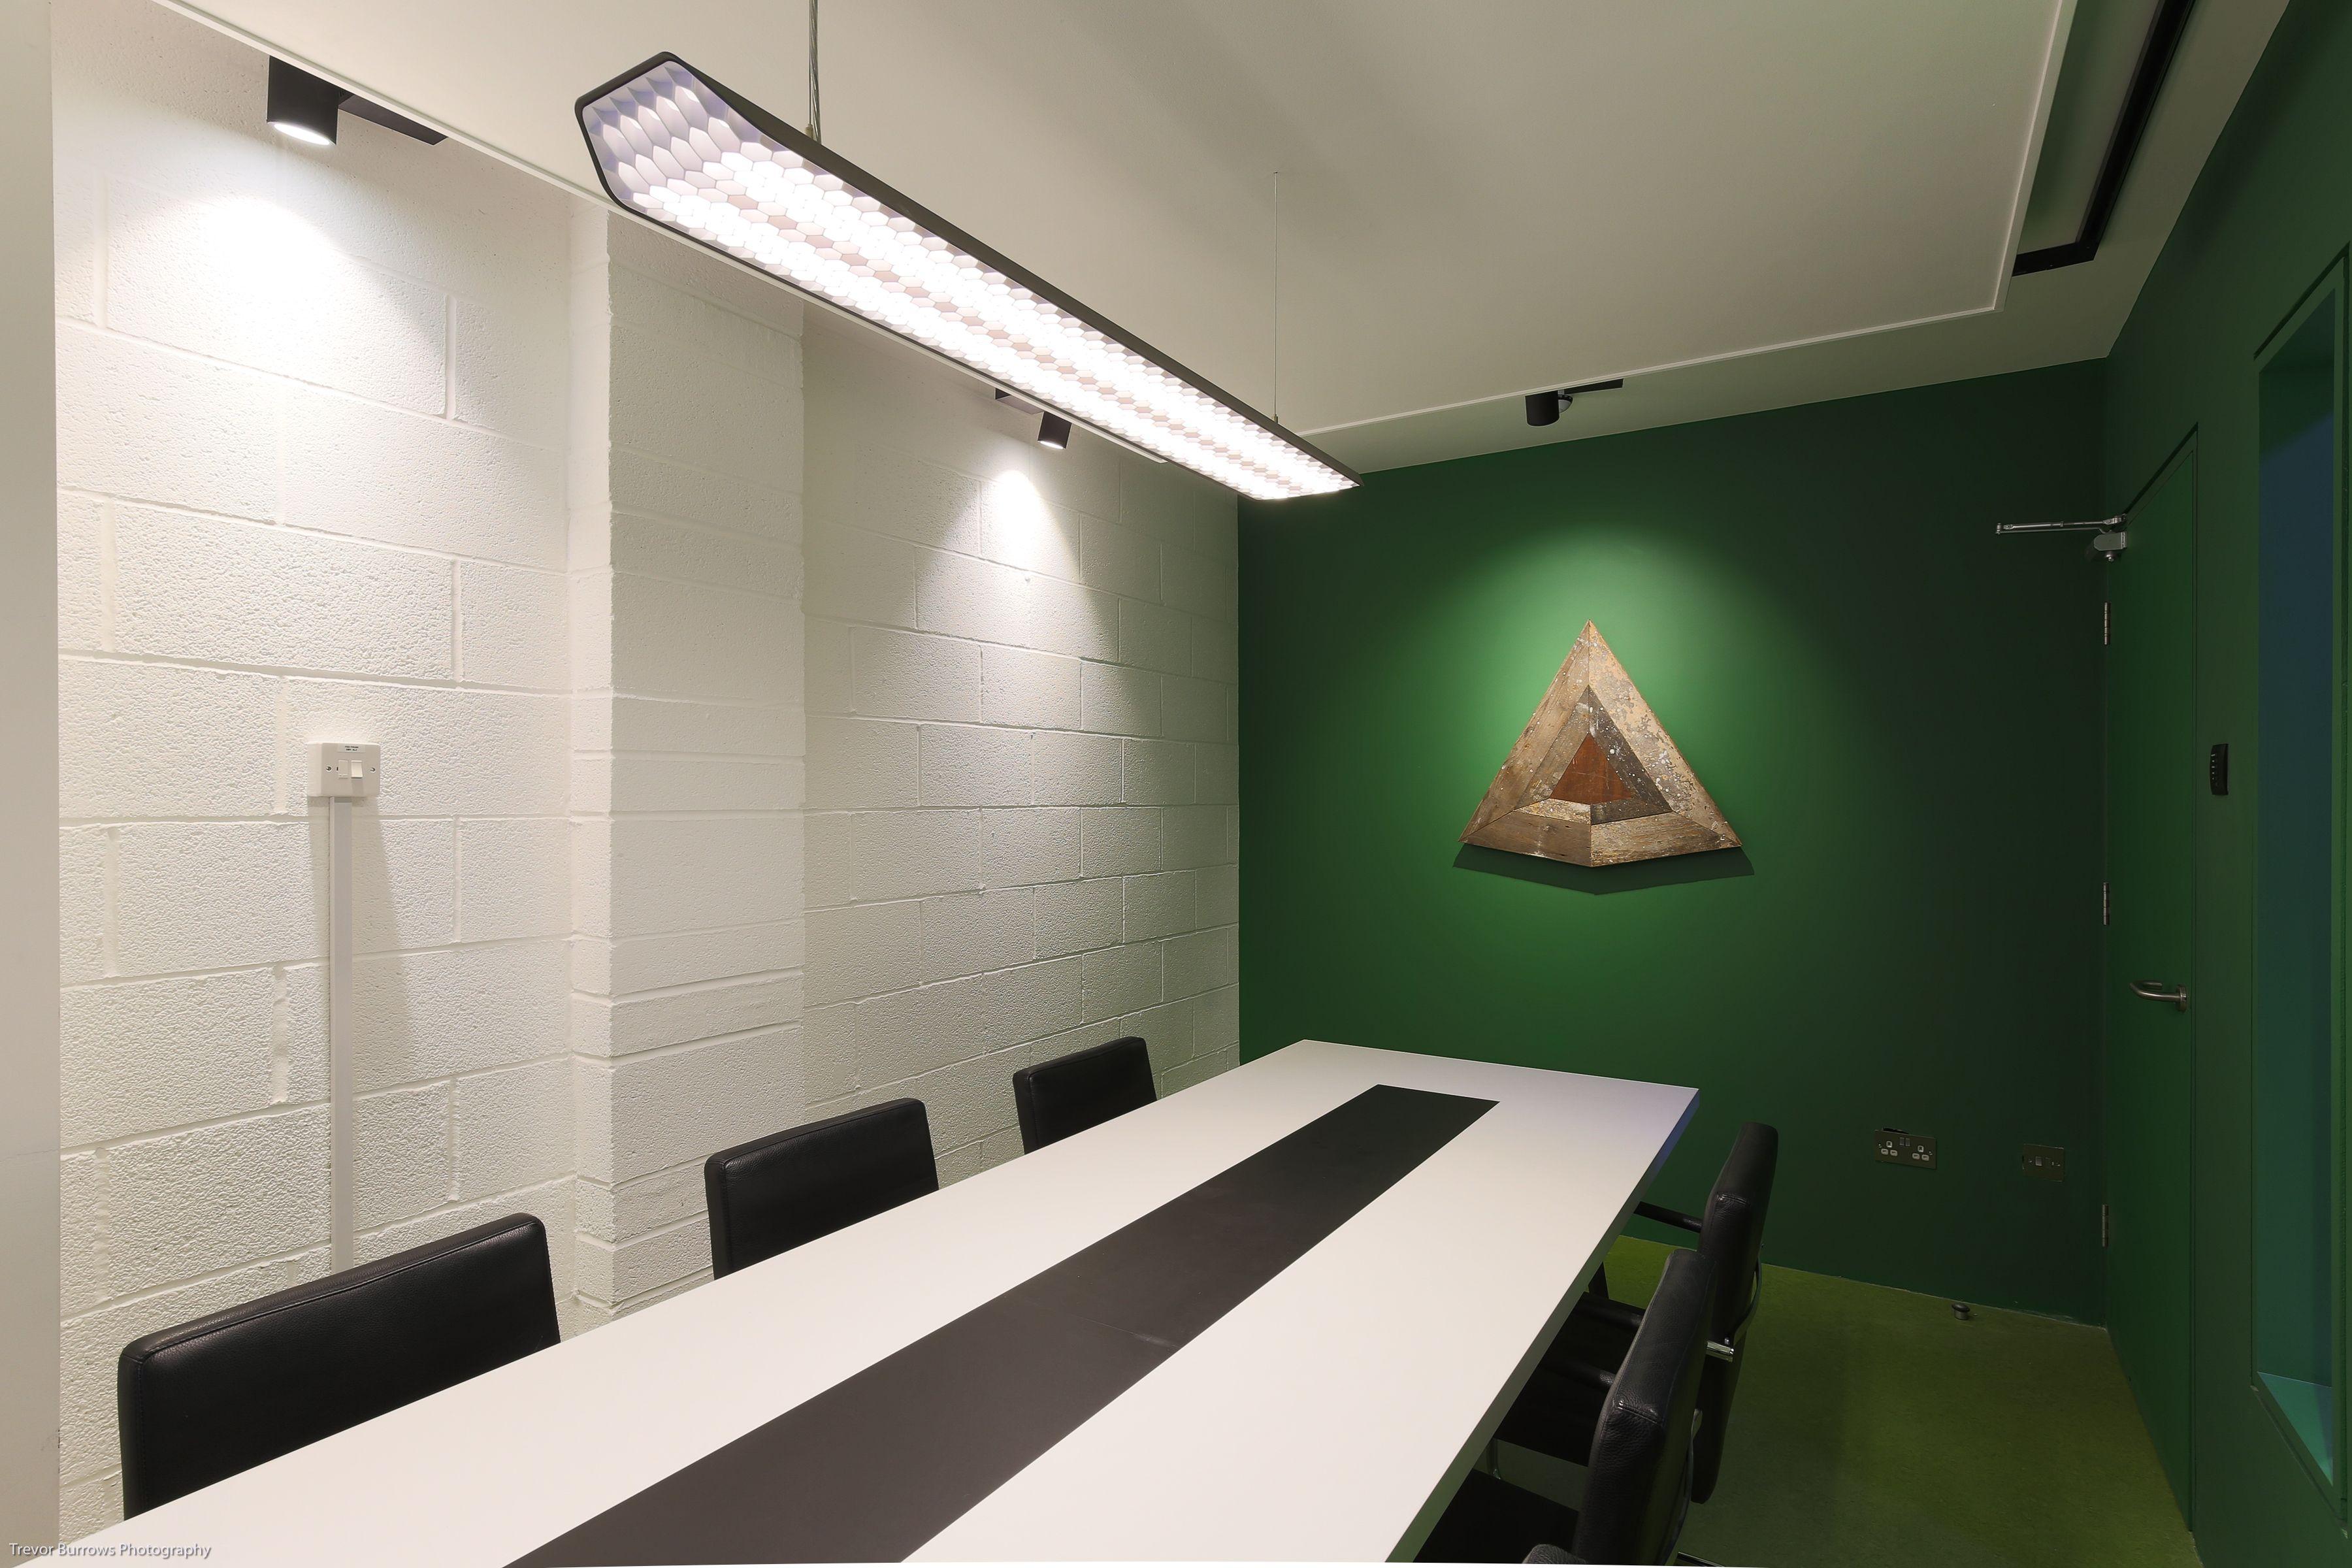 Modular Vaeder pendant light for Meeting Room with Illuma spotlights ...